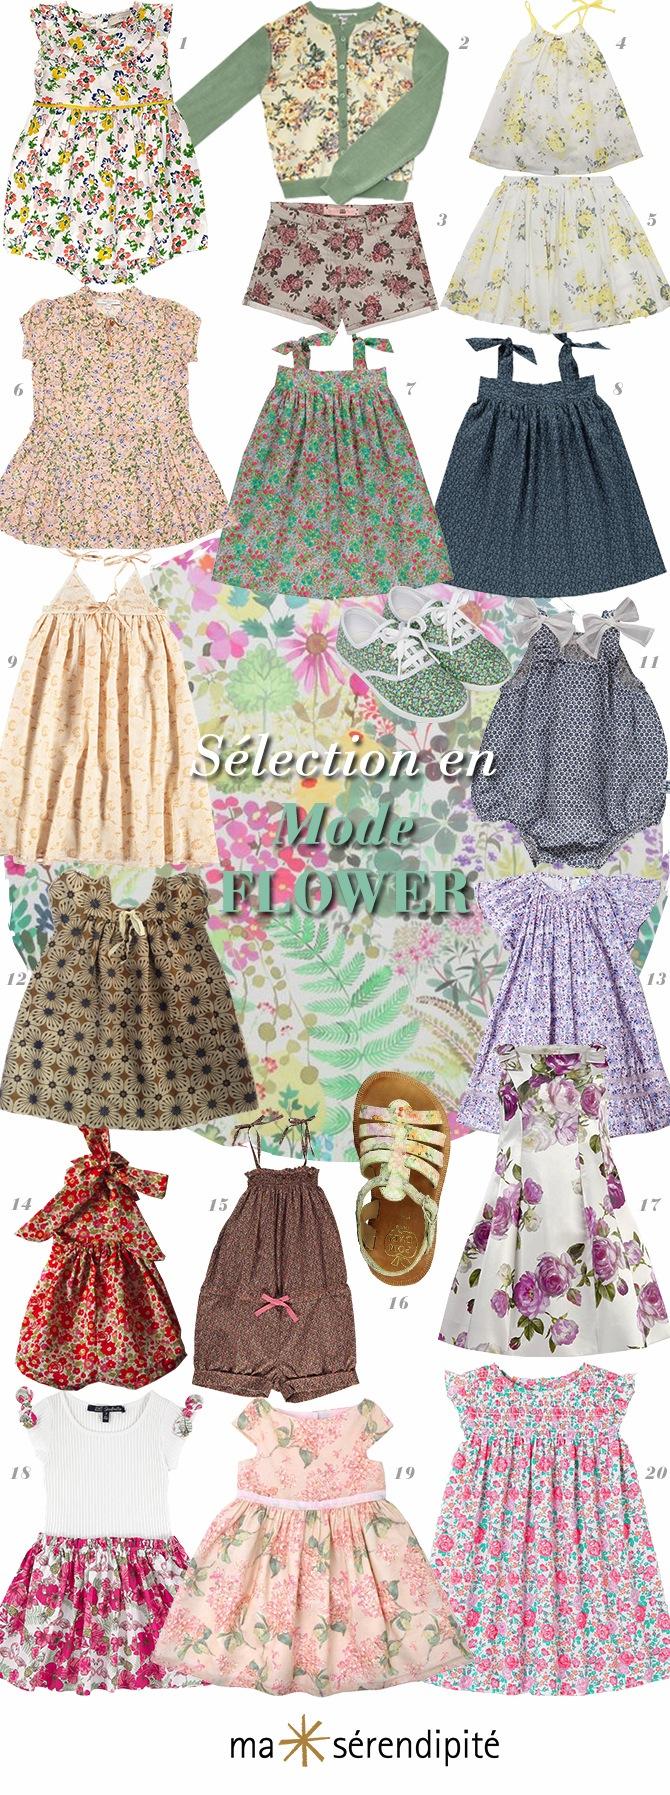 Selection-FLOWER_PE15_MODE-def